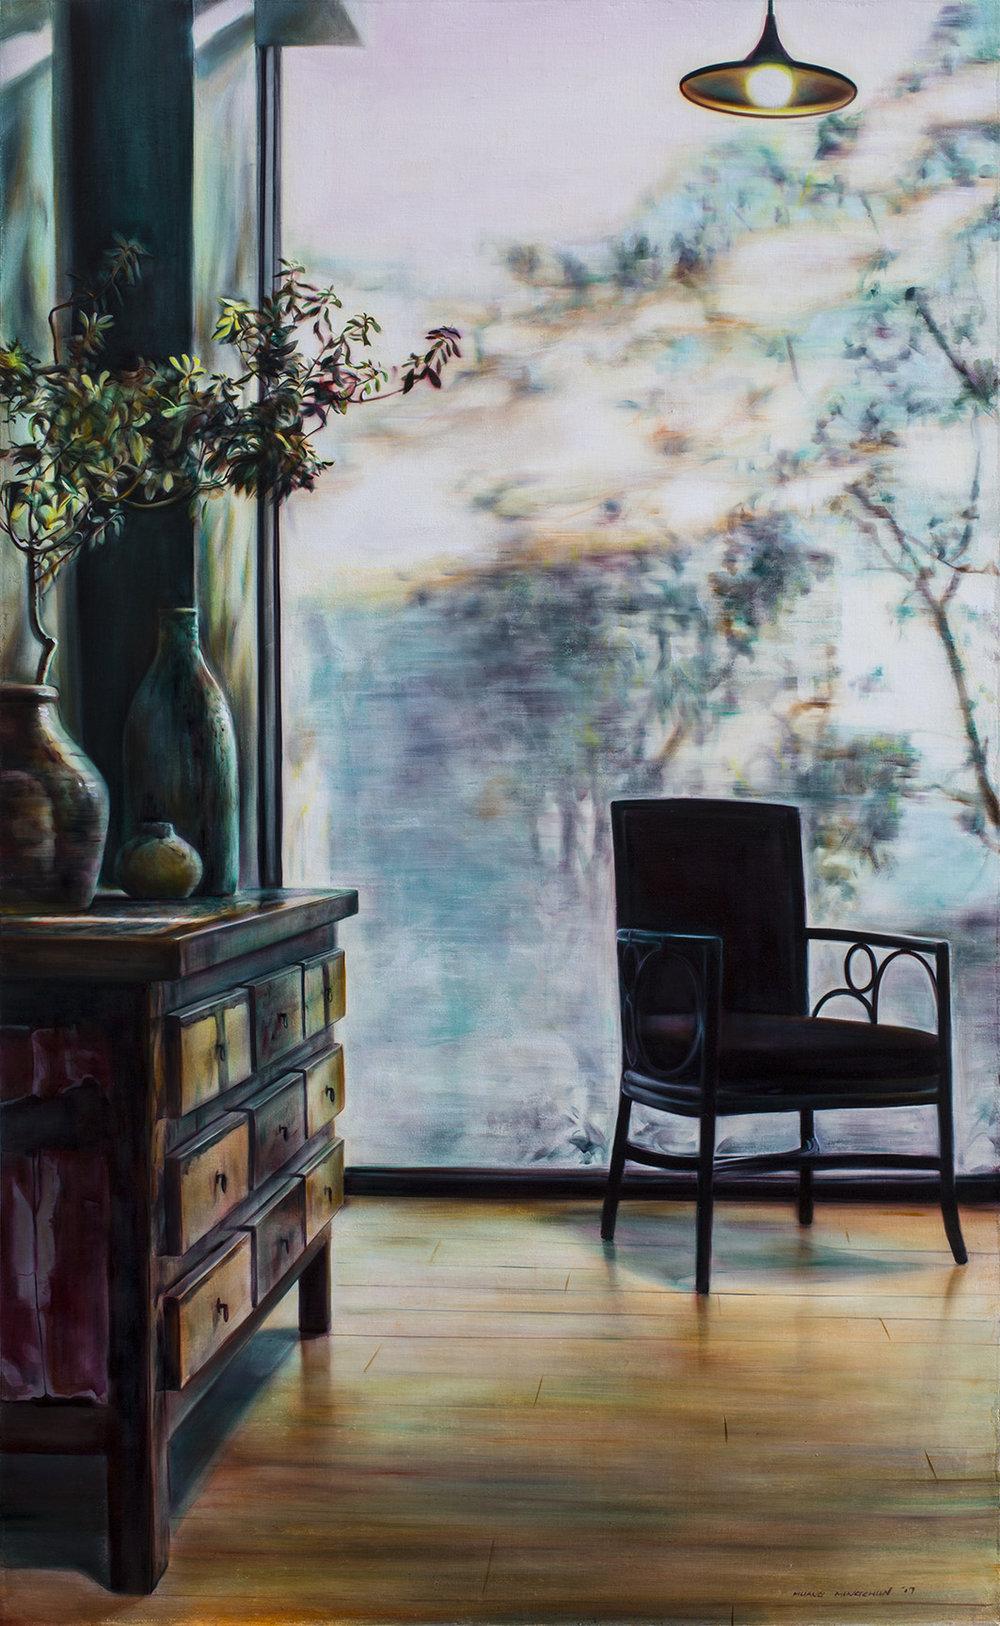 溫度 Temperature1  145.5cm x 89.5cm  油彩畫布Oil on canvas 2017